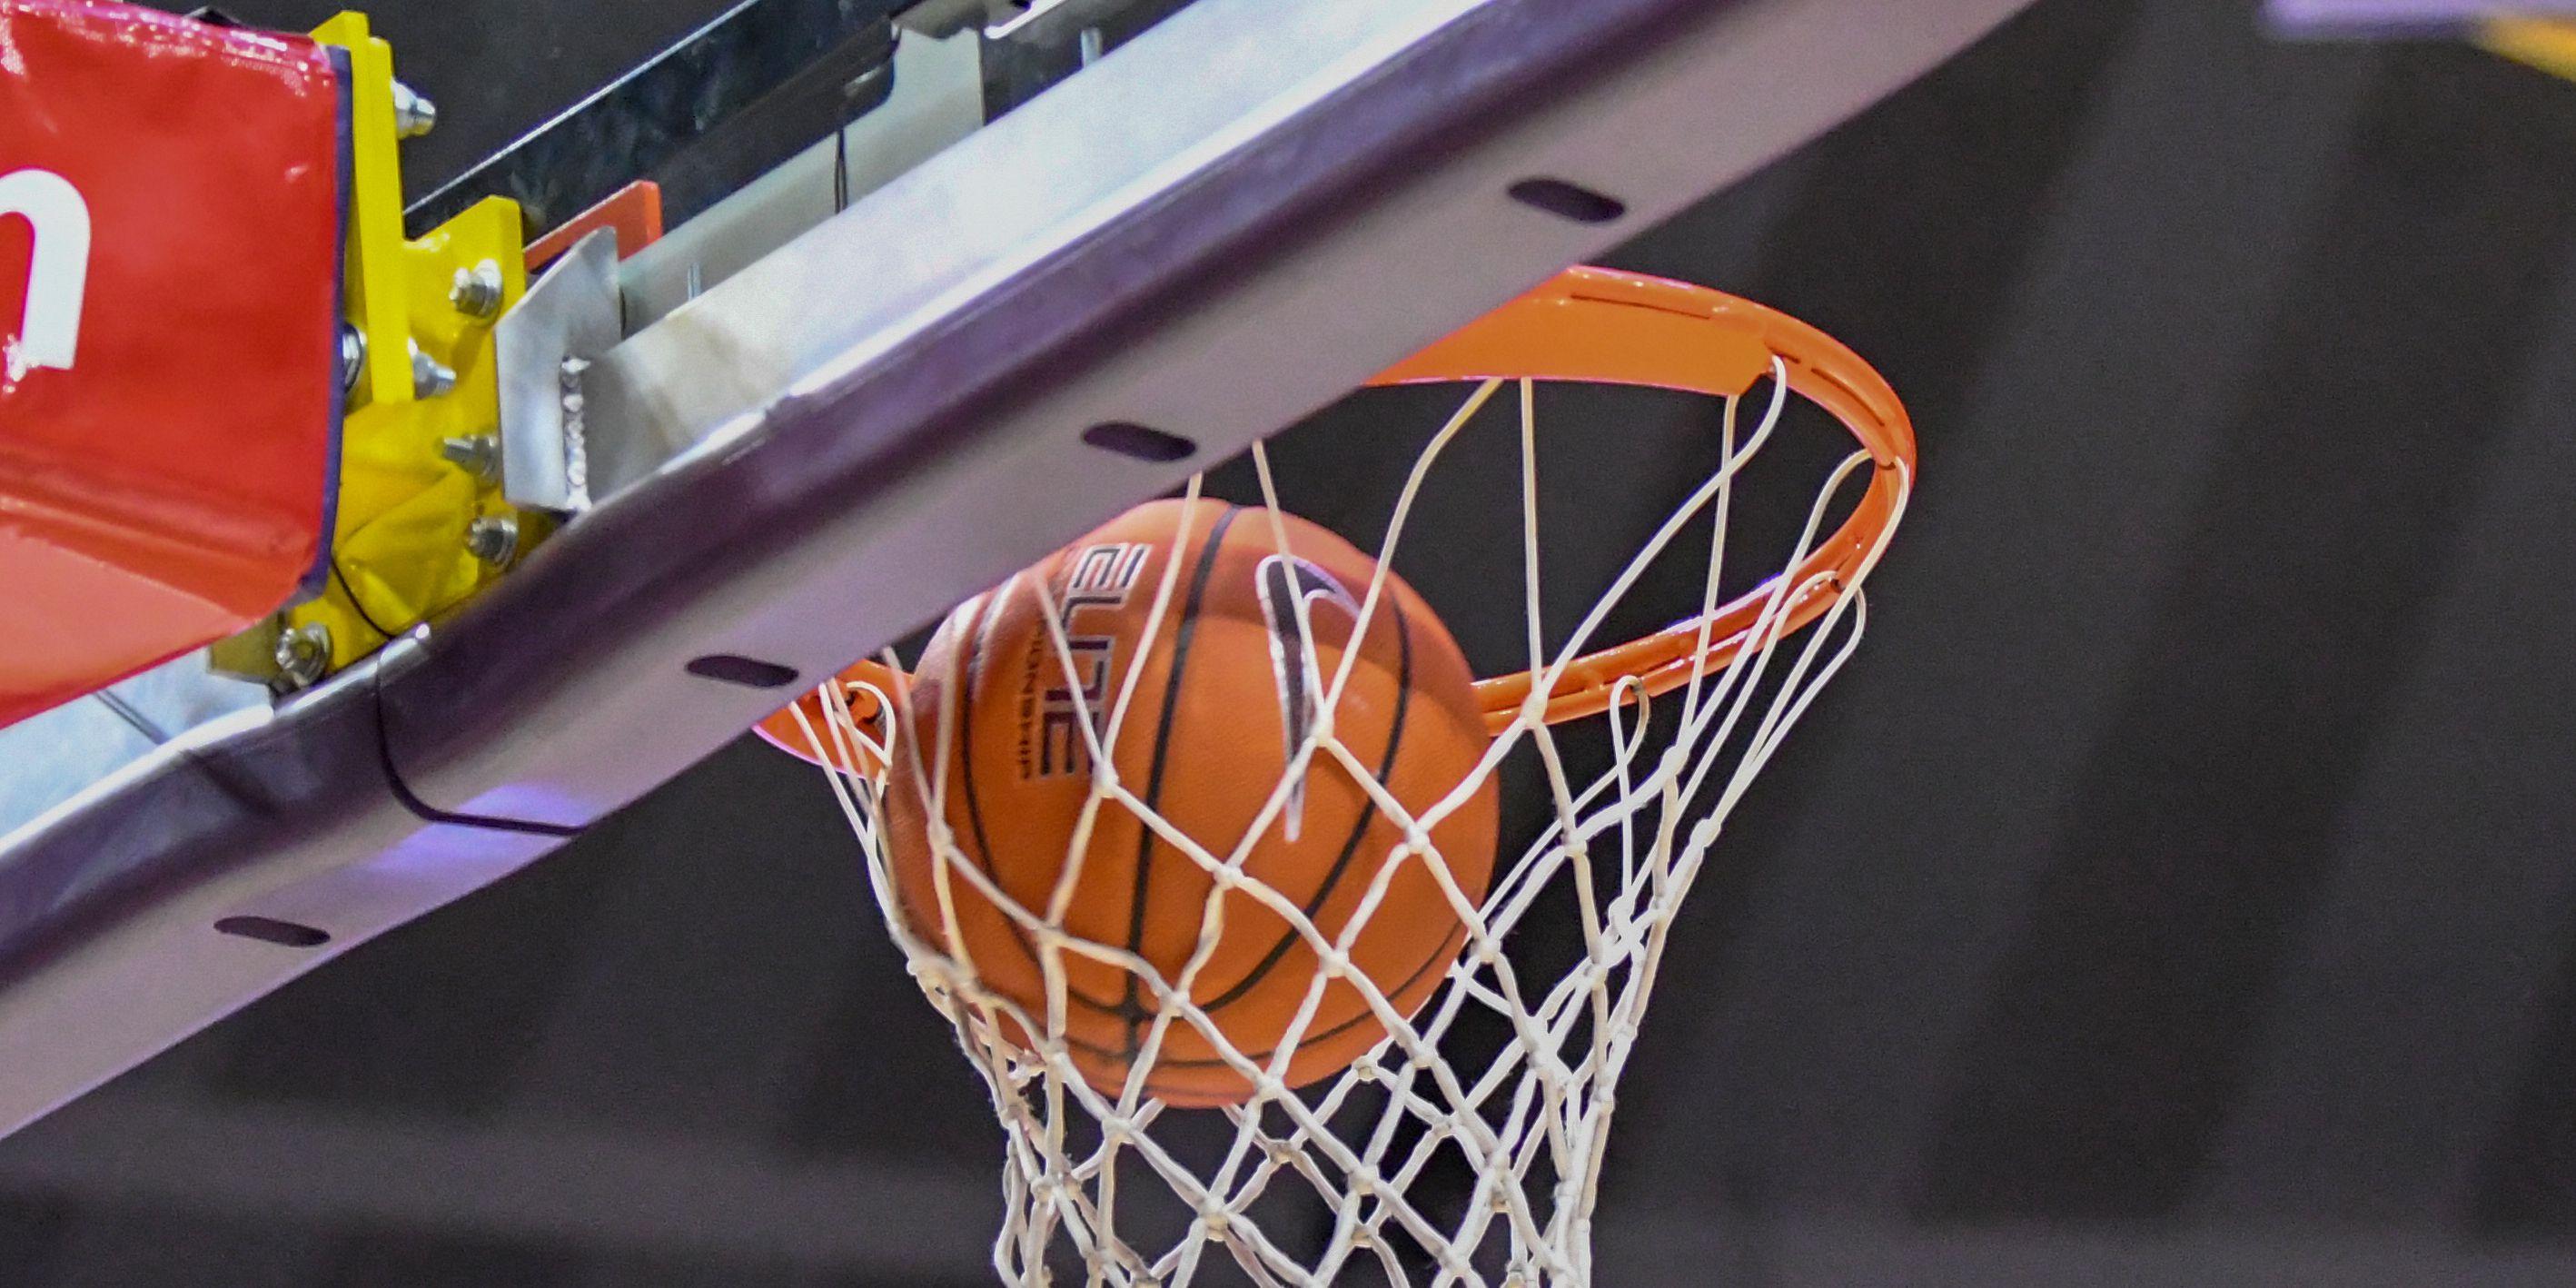 LSU women's basketball 2019/20 schedule